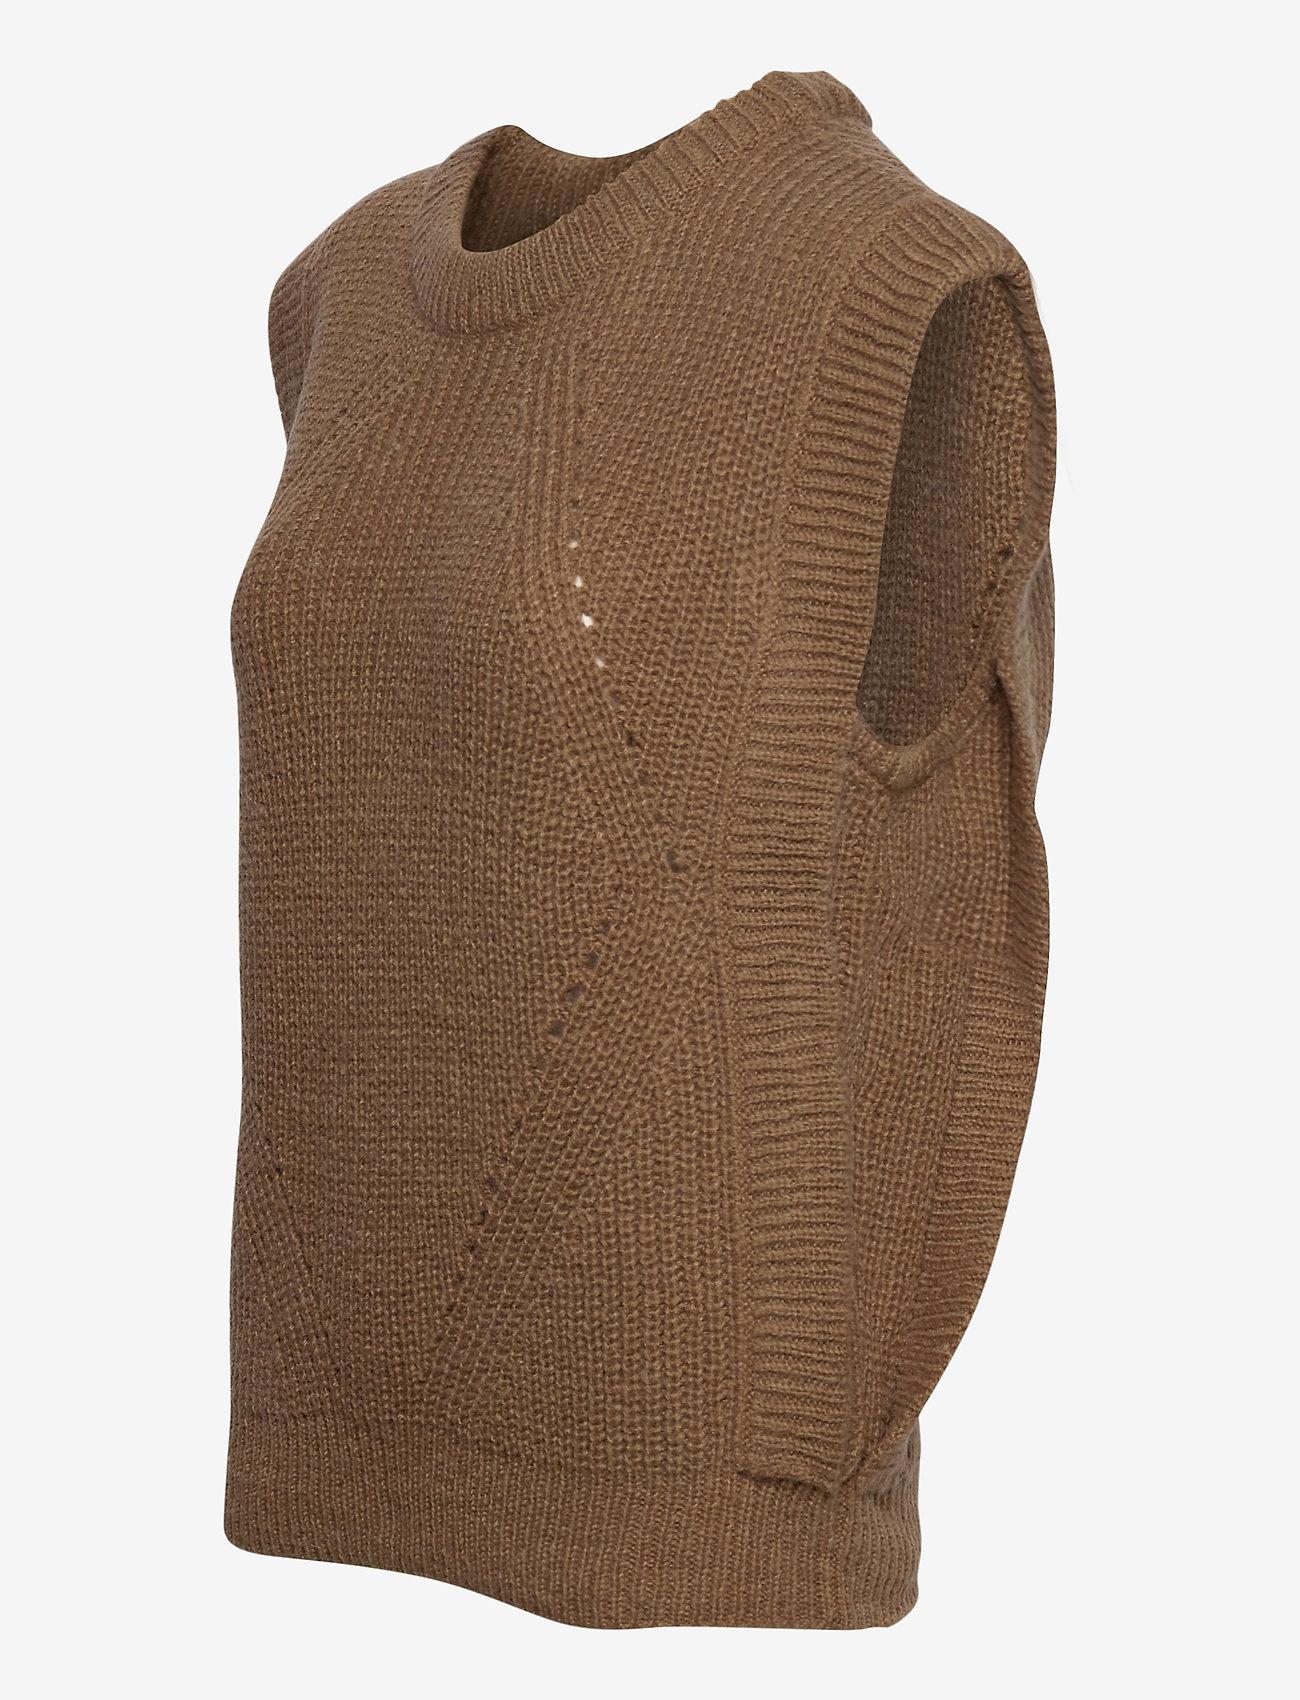 Abenasz Vest (Brownie) (44.96 €) - Saint Tropez o4nGY